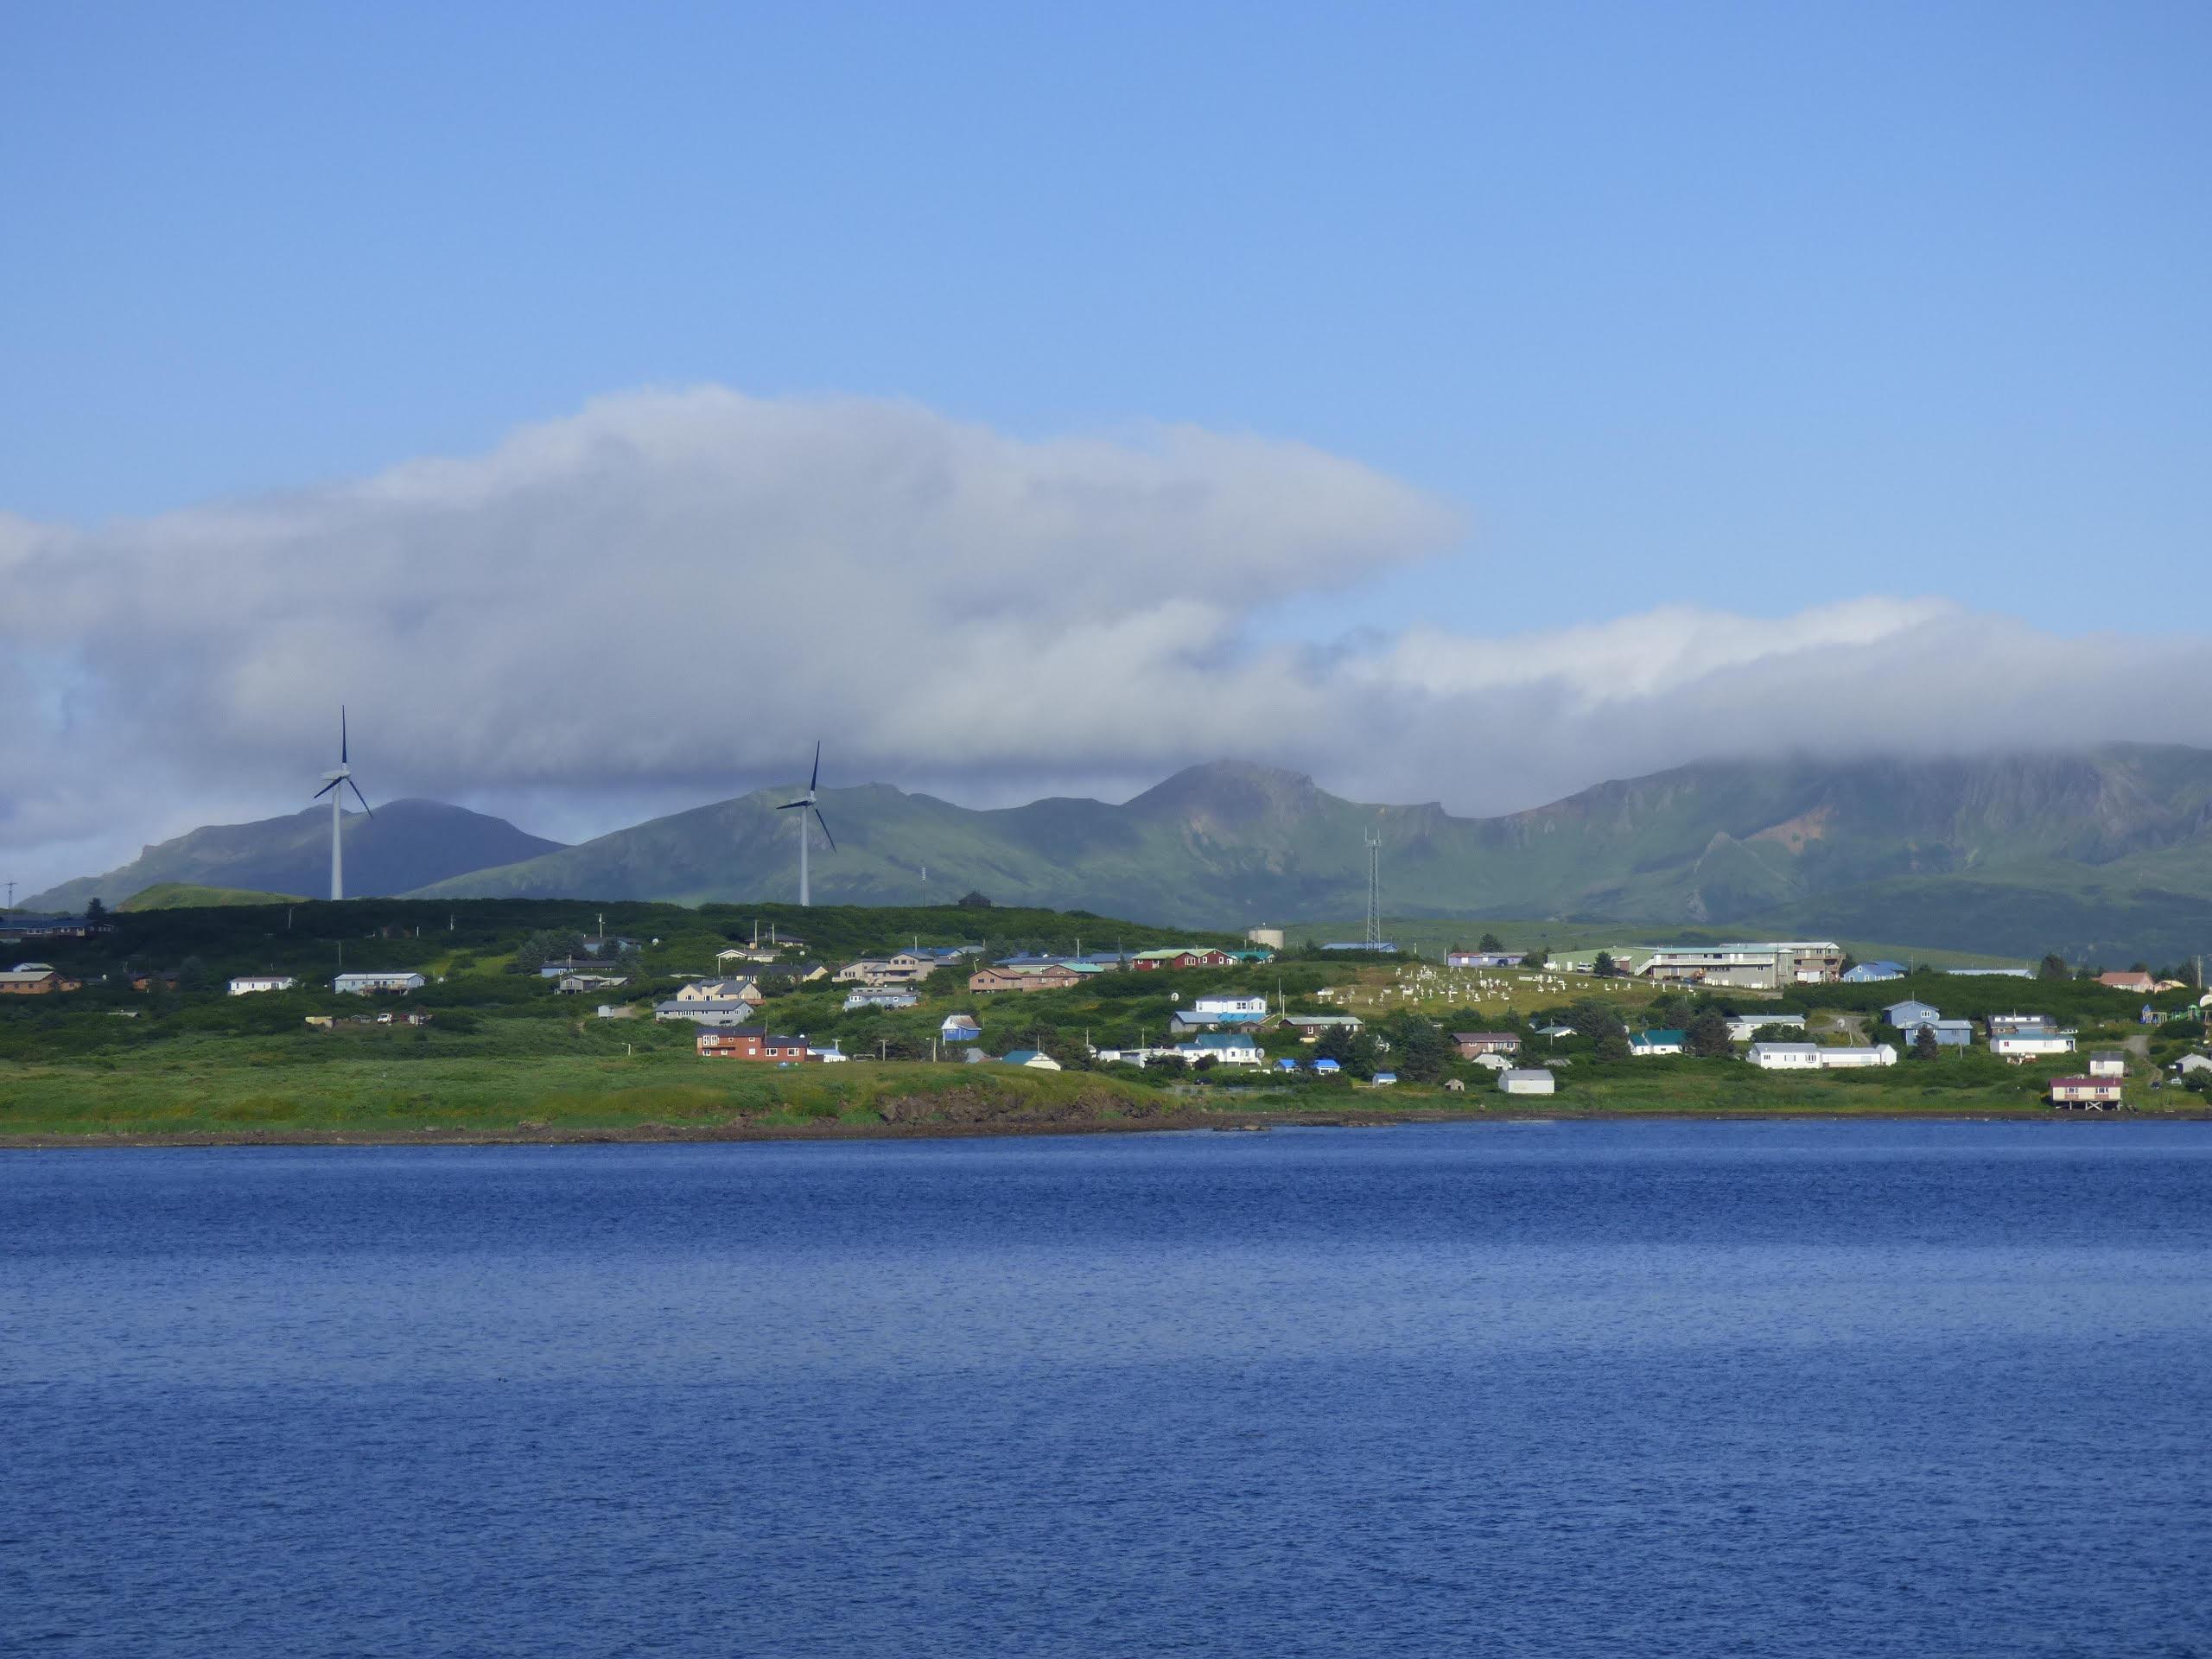 Sand Point wind turbine (Photo by Zoe Sobel, Alaska's Energy Desk - Unlaska)